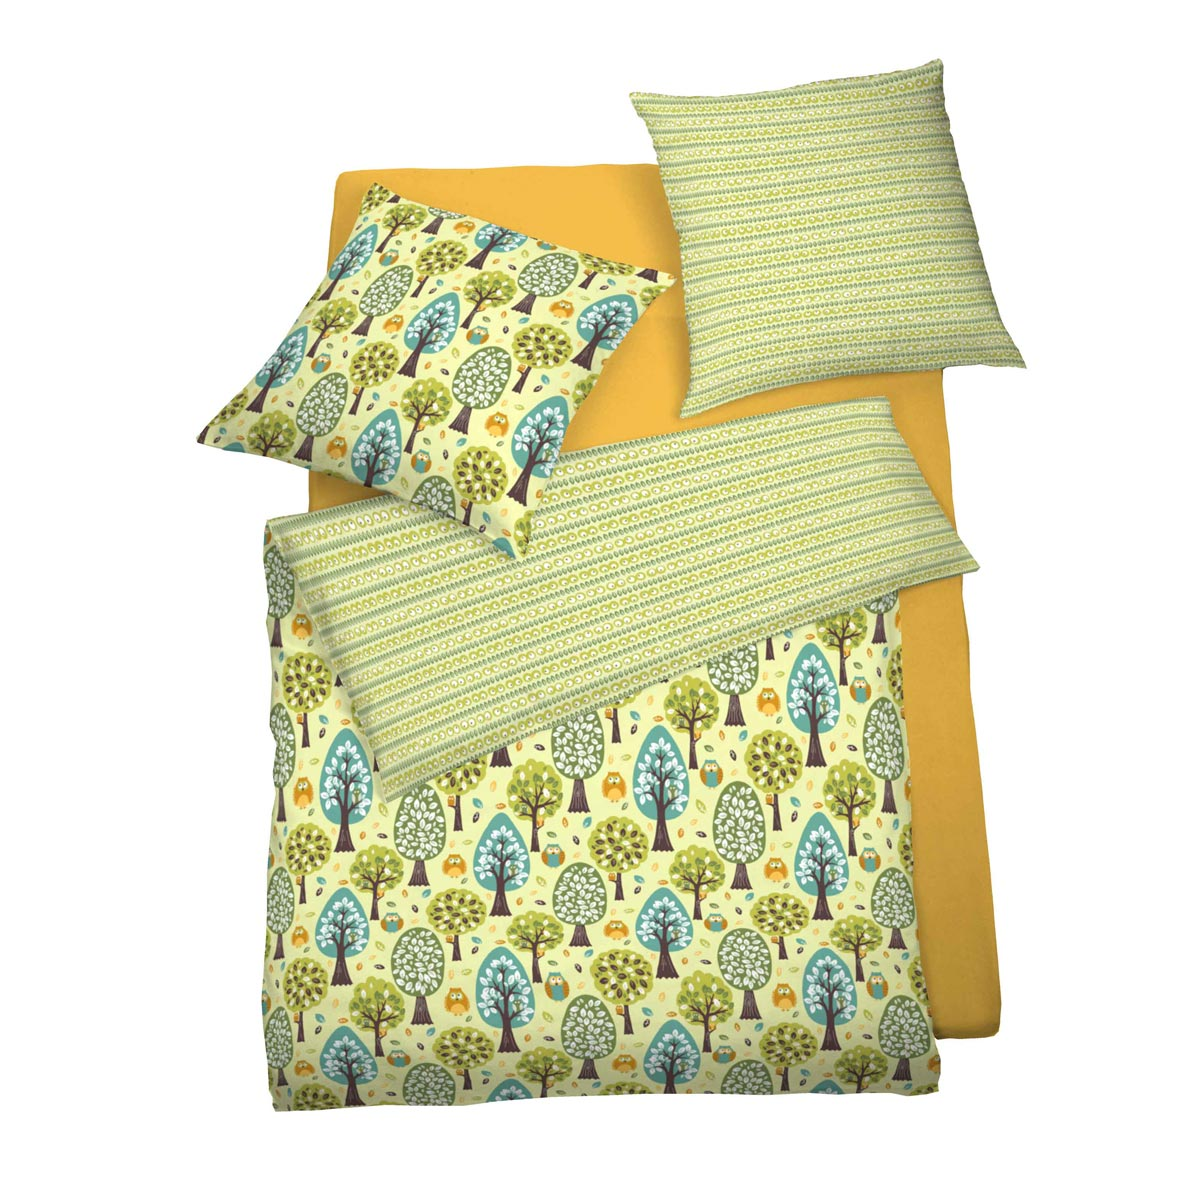 schlafgut microfaser velours bettw sche 4775 676 g nstig. Black Bedroom Furniture Sets. Home Design Ideas